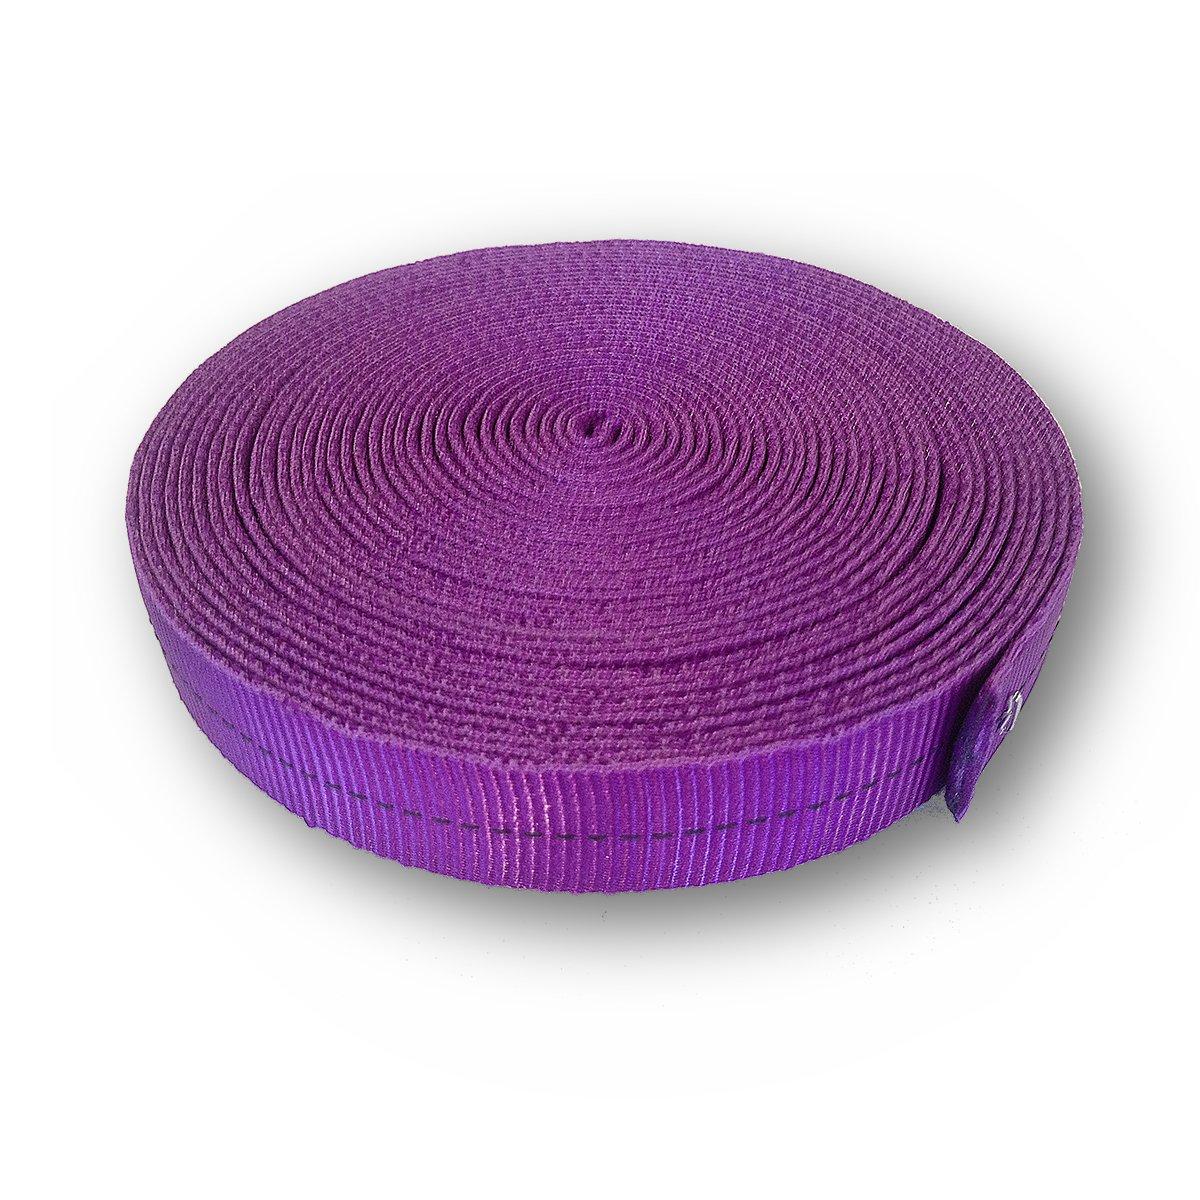 OmniProGear 4000lb MBS Tubular Webbing 1 inch x 10 yards Purple Made in USA